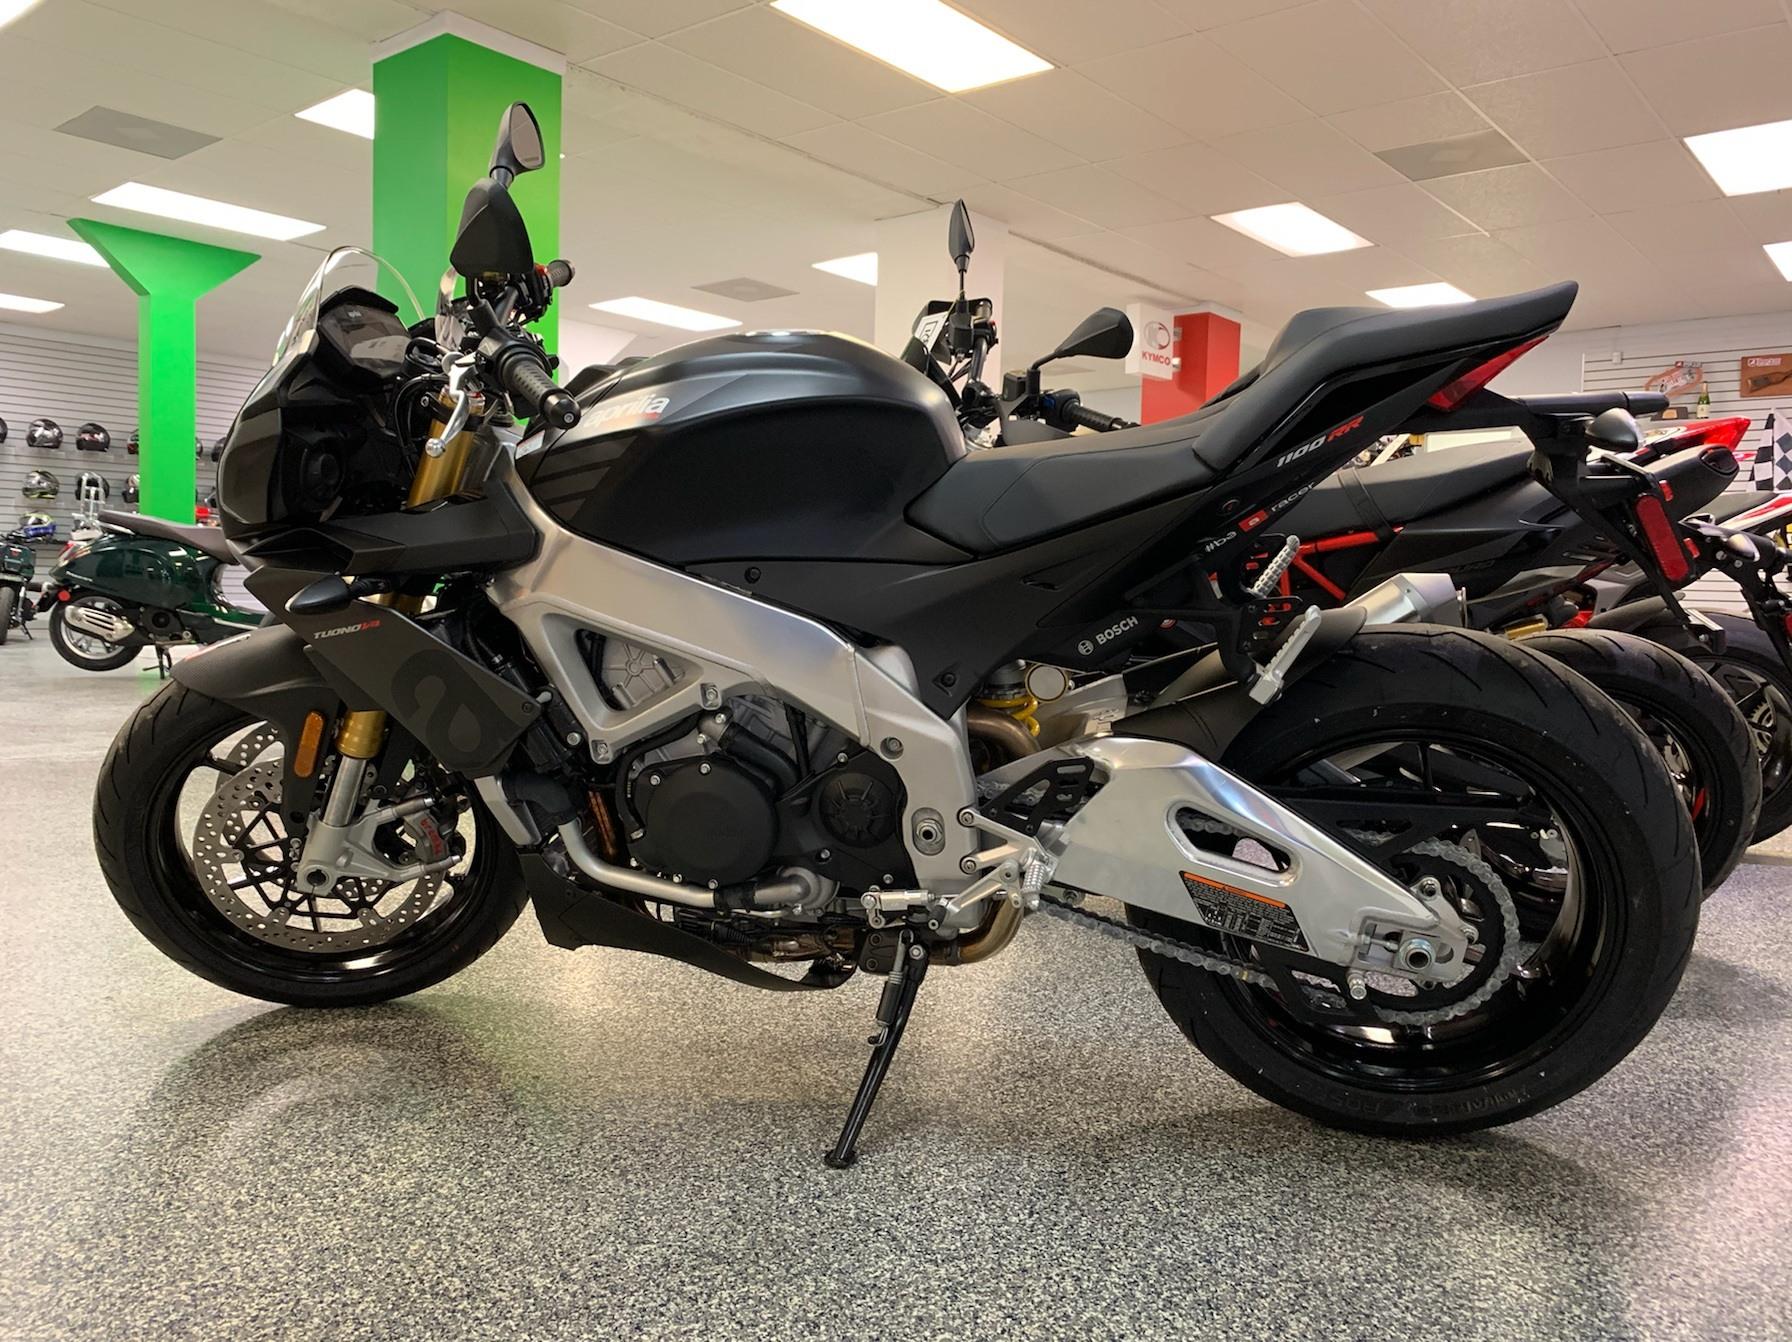 New 2019 Aprilia Tuono V4 1100 Rr Abs Motorcycles In Pensacola Fl 001126 Grigio Magny Cours